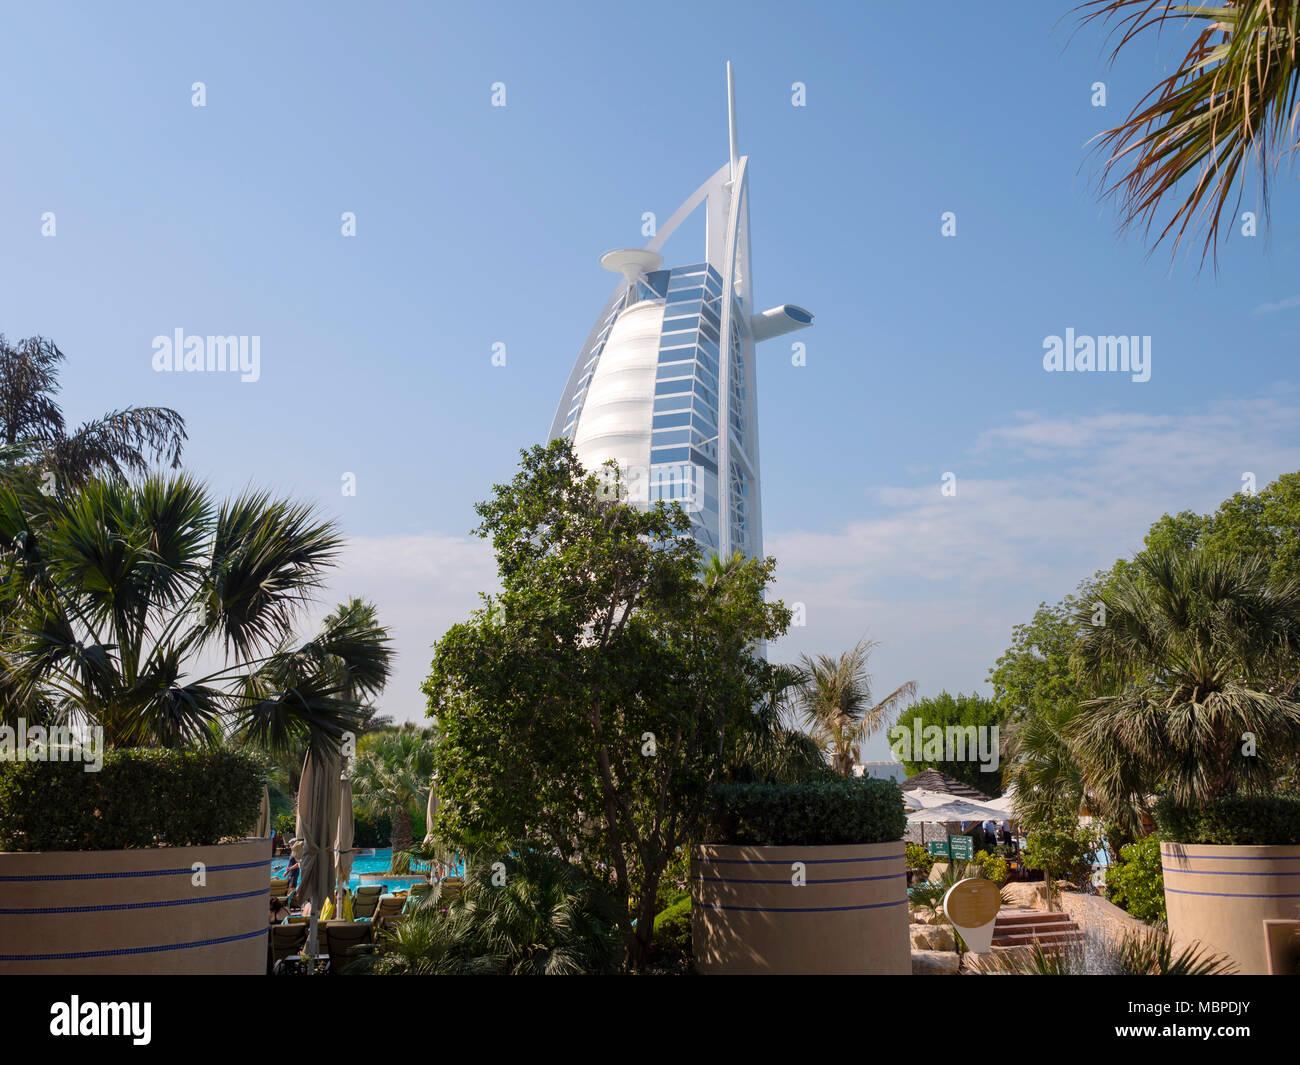 DUBAI,UAE - DECEMBER 18, 2017: The Burj al Arab behind the trees, view from Jumeirah Beach Hotel in Dubai - Stock Image